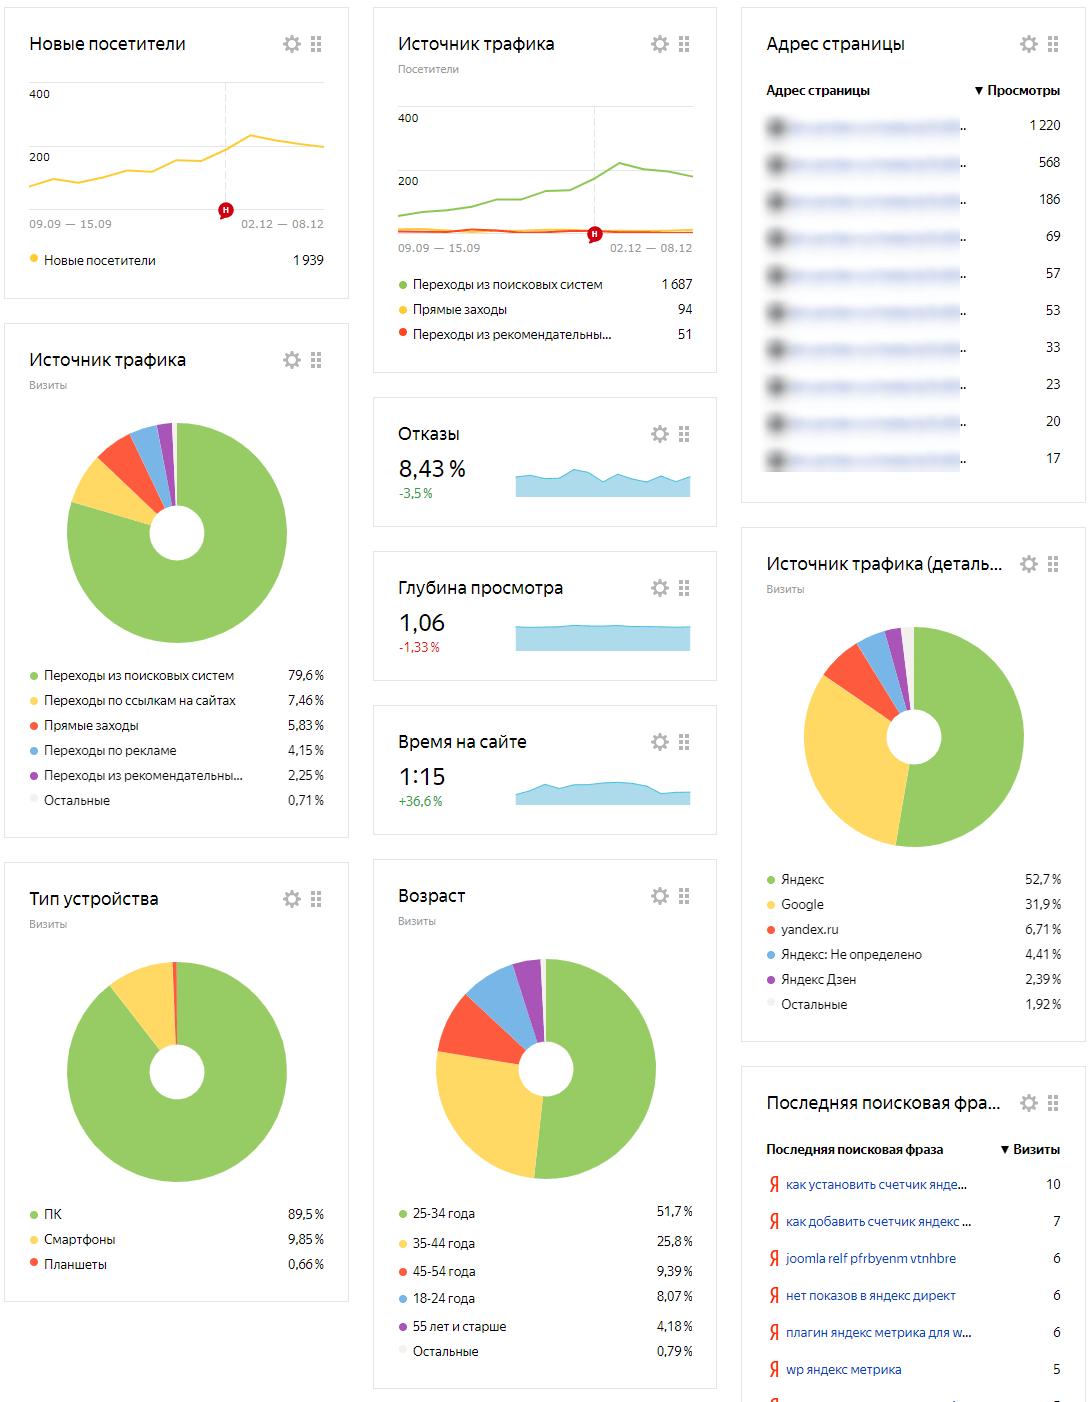 Настройка счётчика и целей Яндекс Метрики - Отчёты